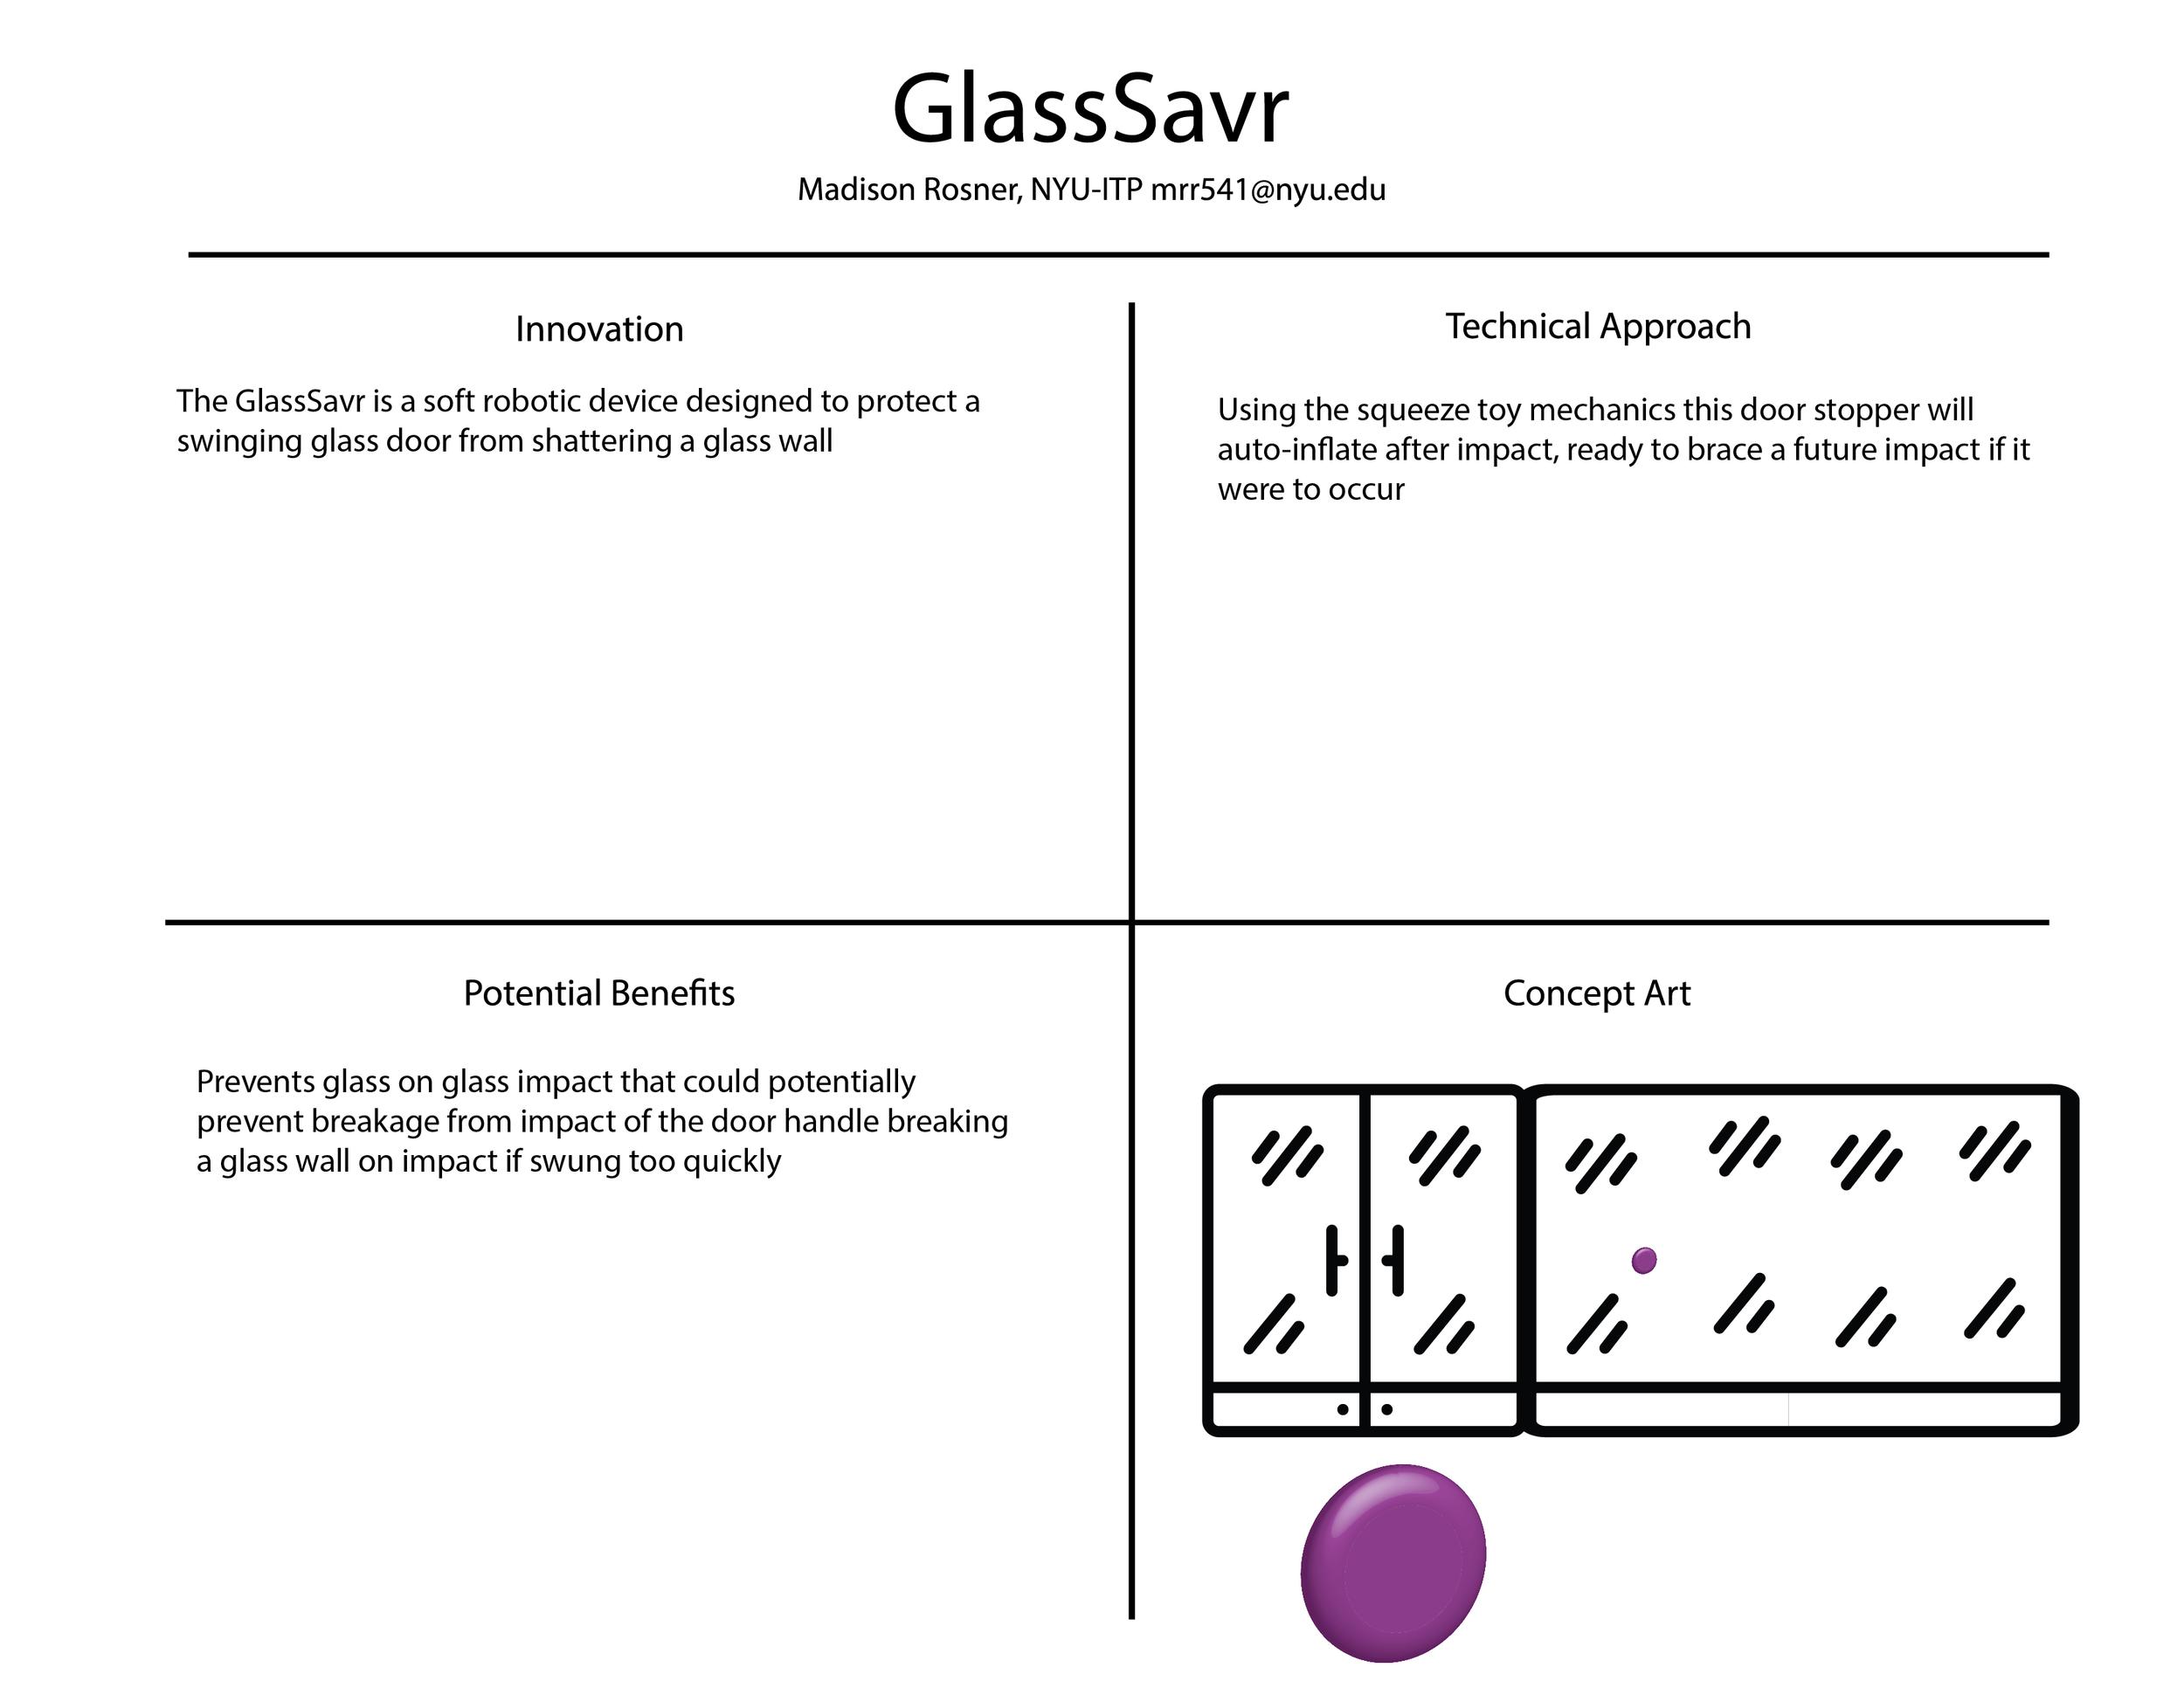 glassavr-01.png